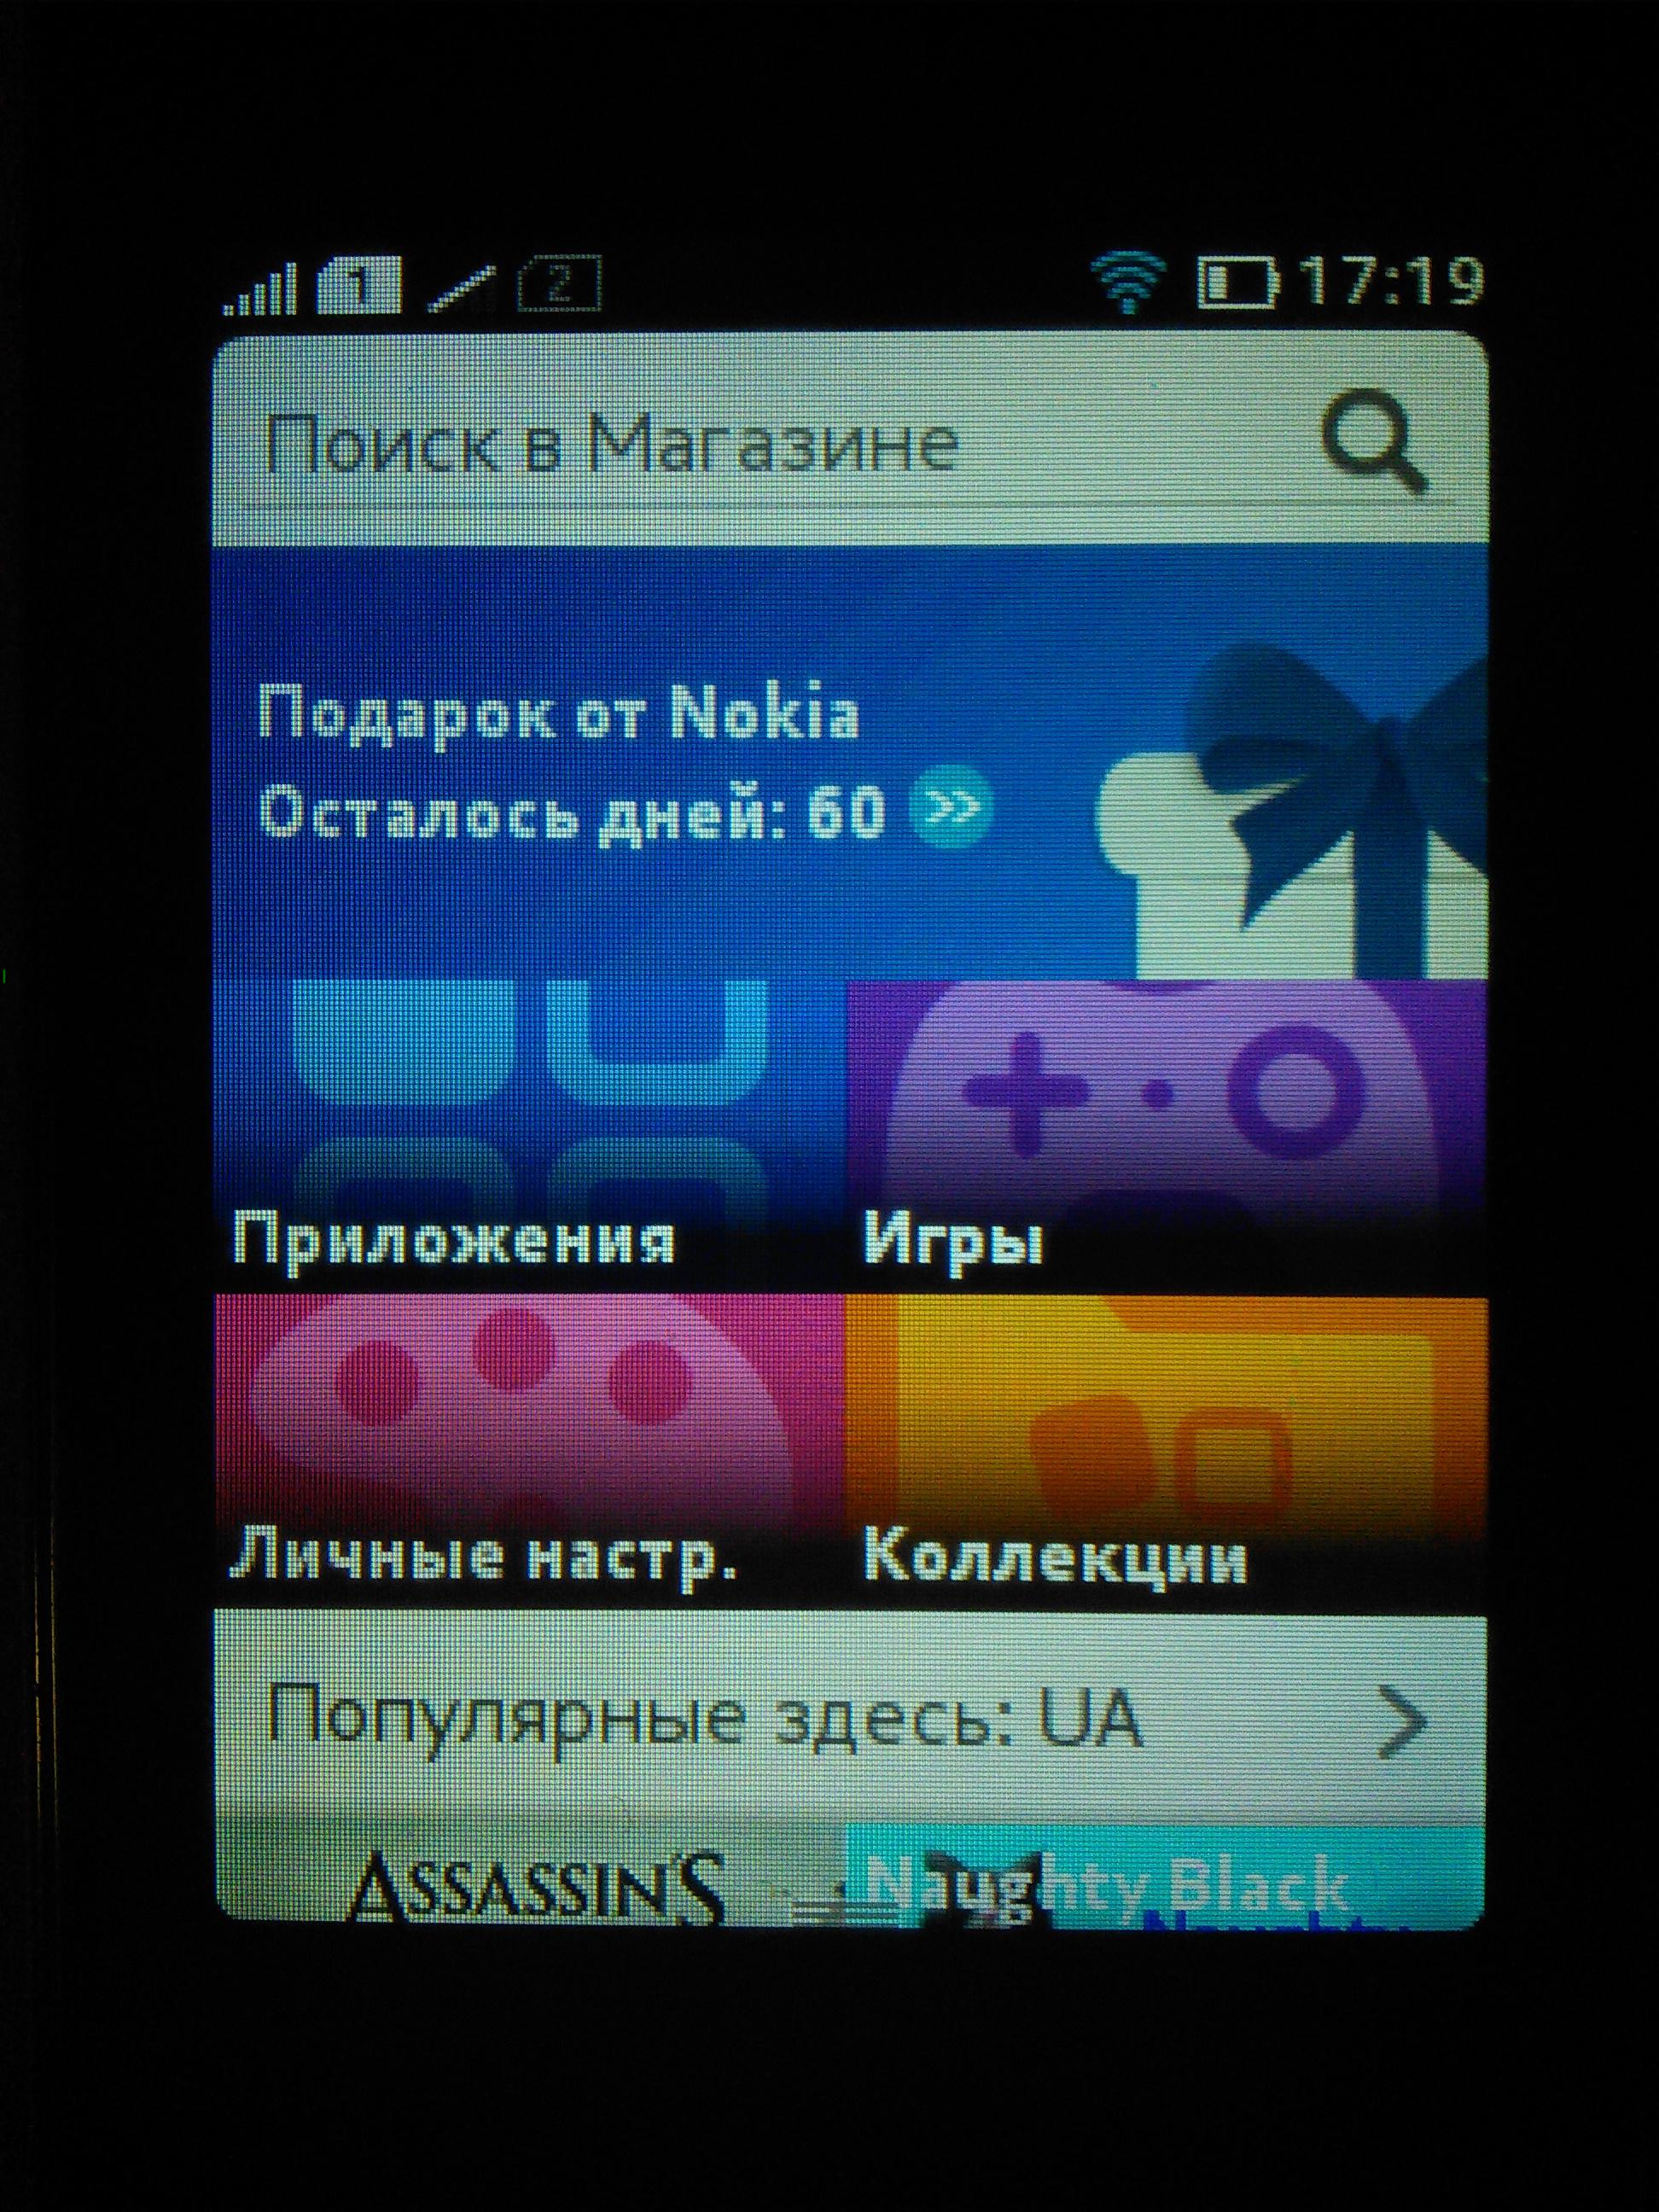 IMG_20140217_171934